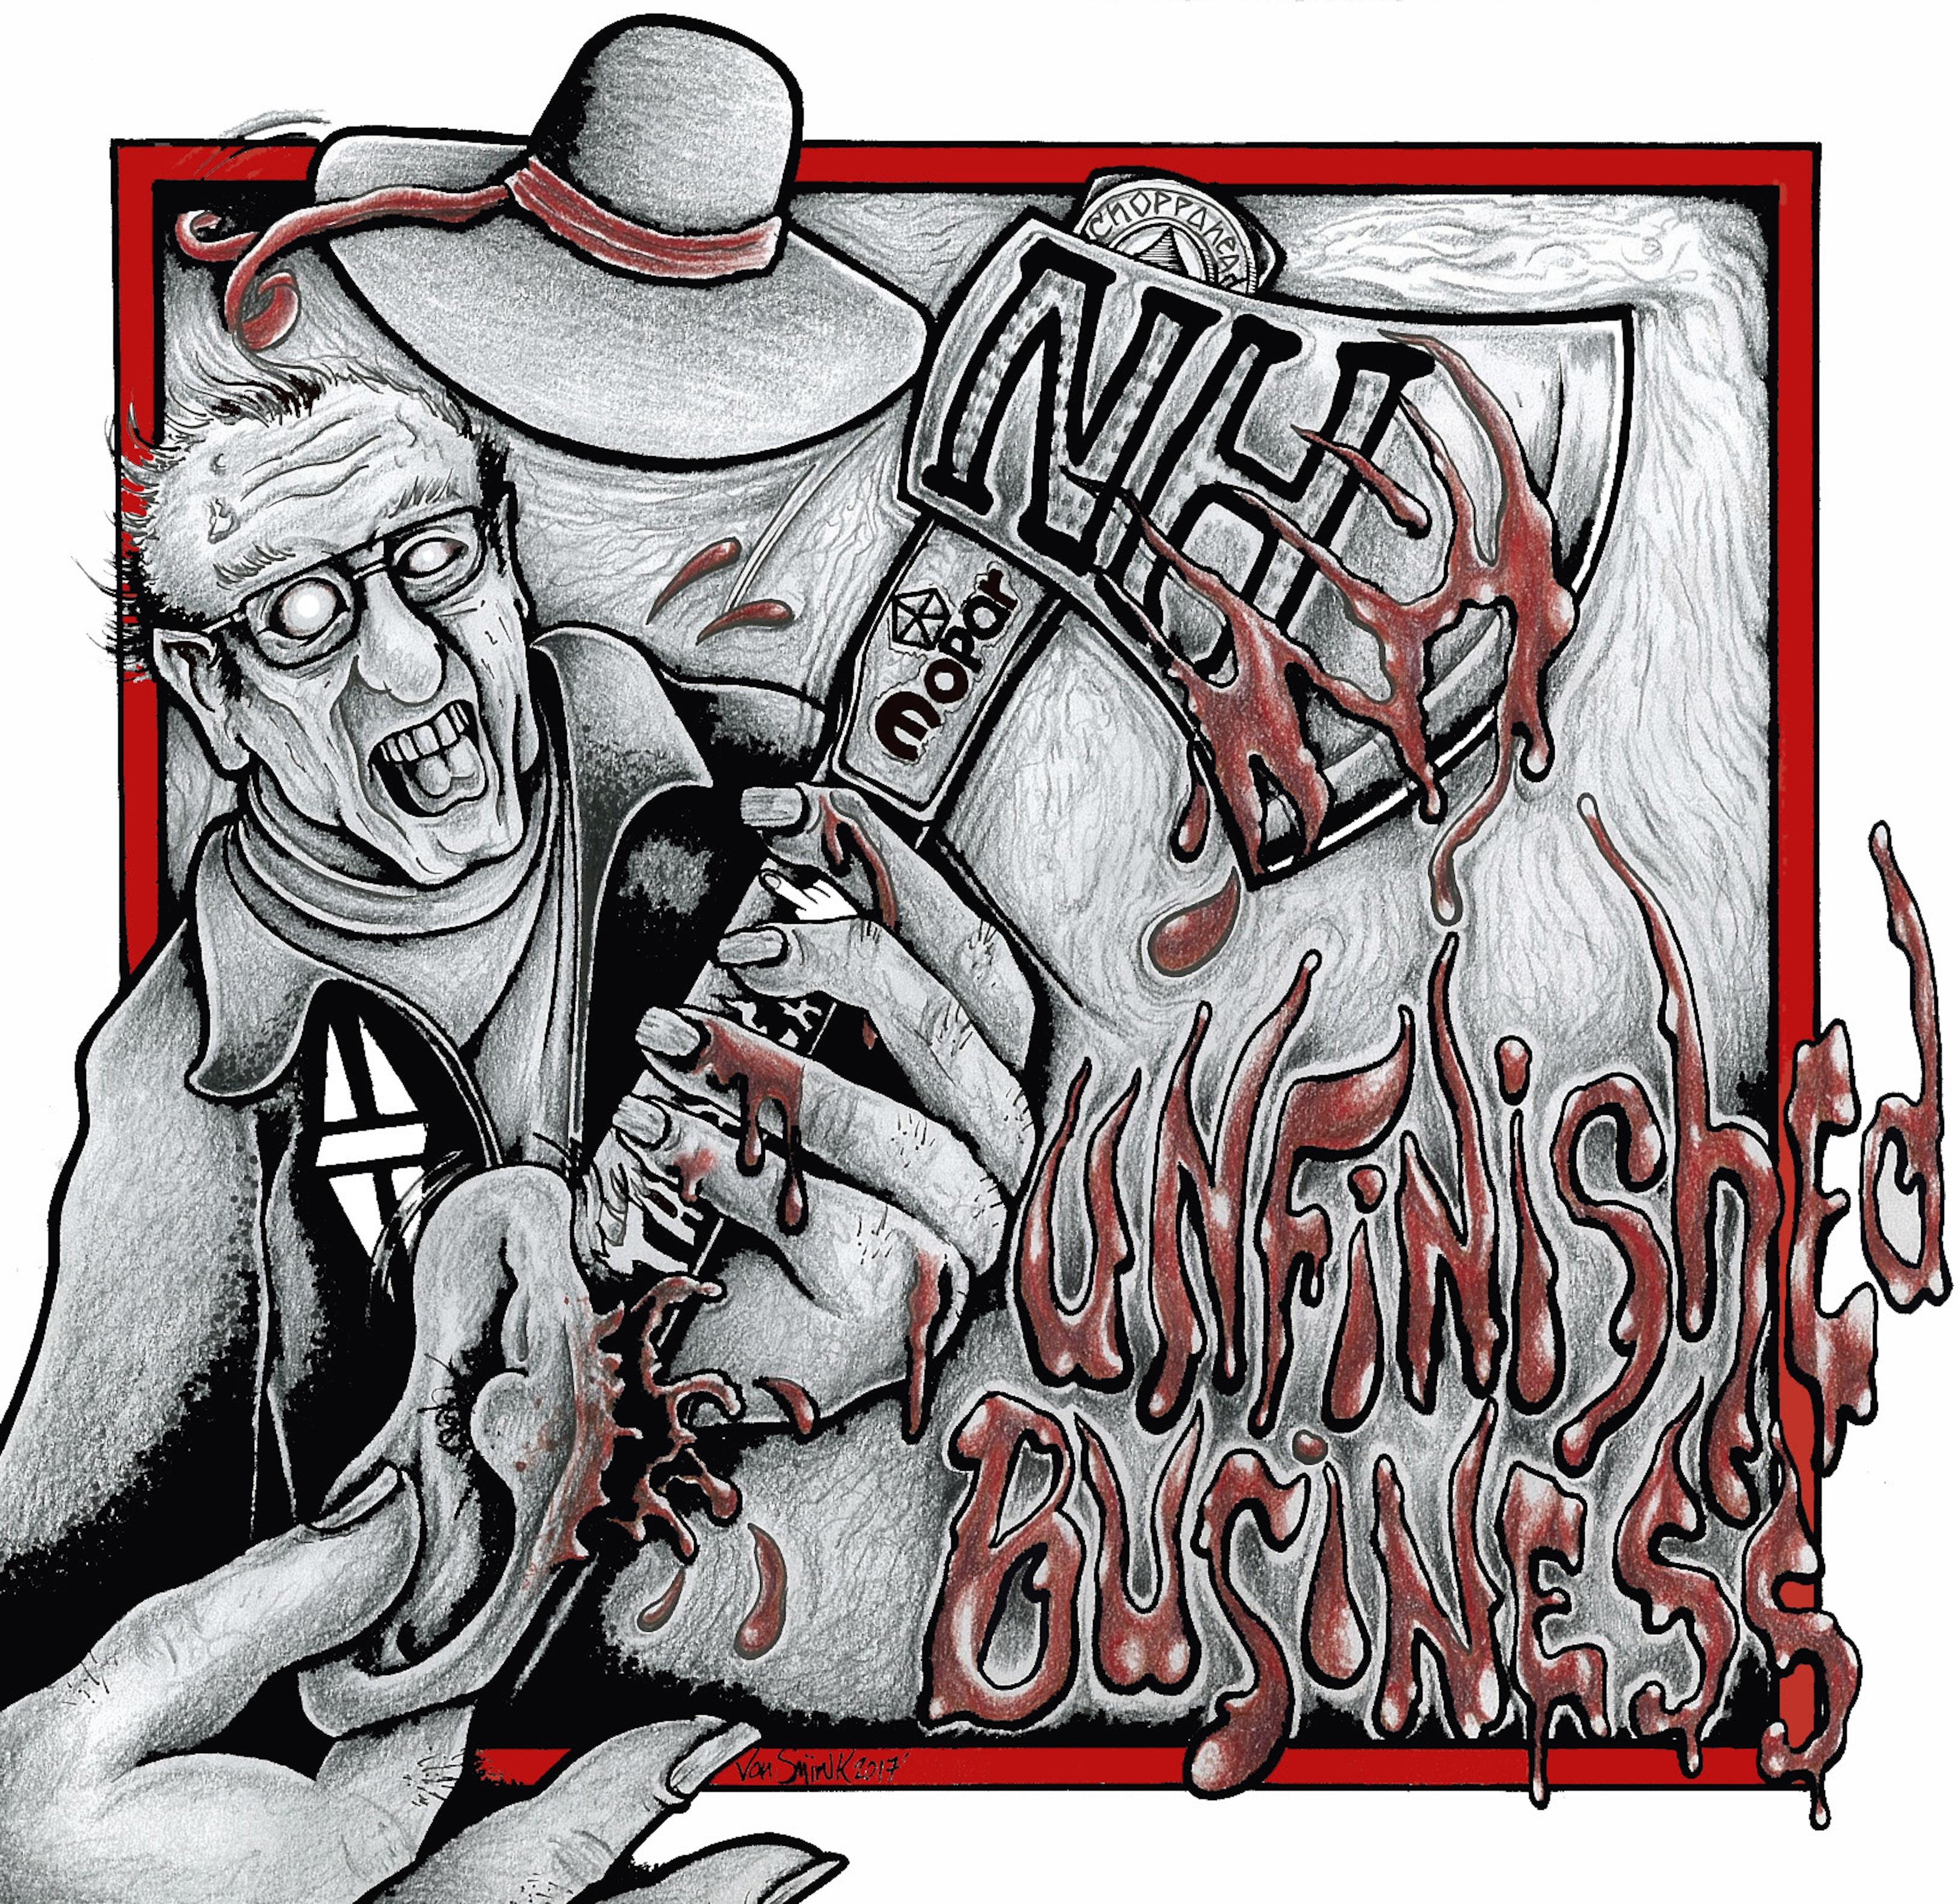 Scissorfight - Unfinished Business